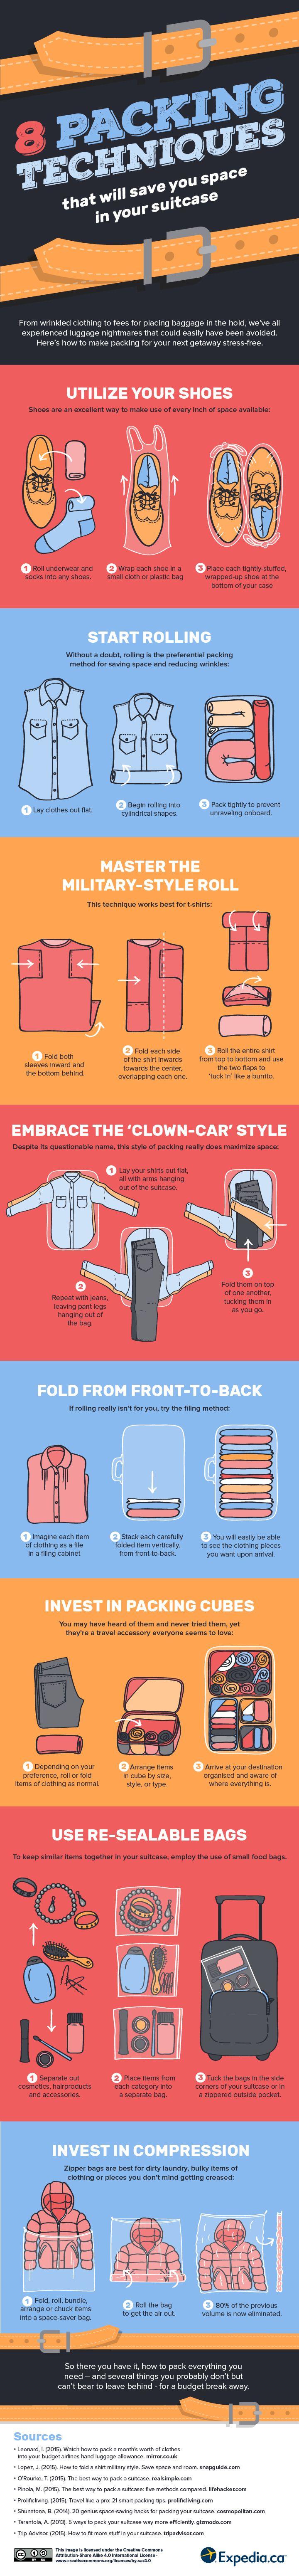 8 Genius Hacks for Saving Space in Your Overstuffed Suitcase